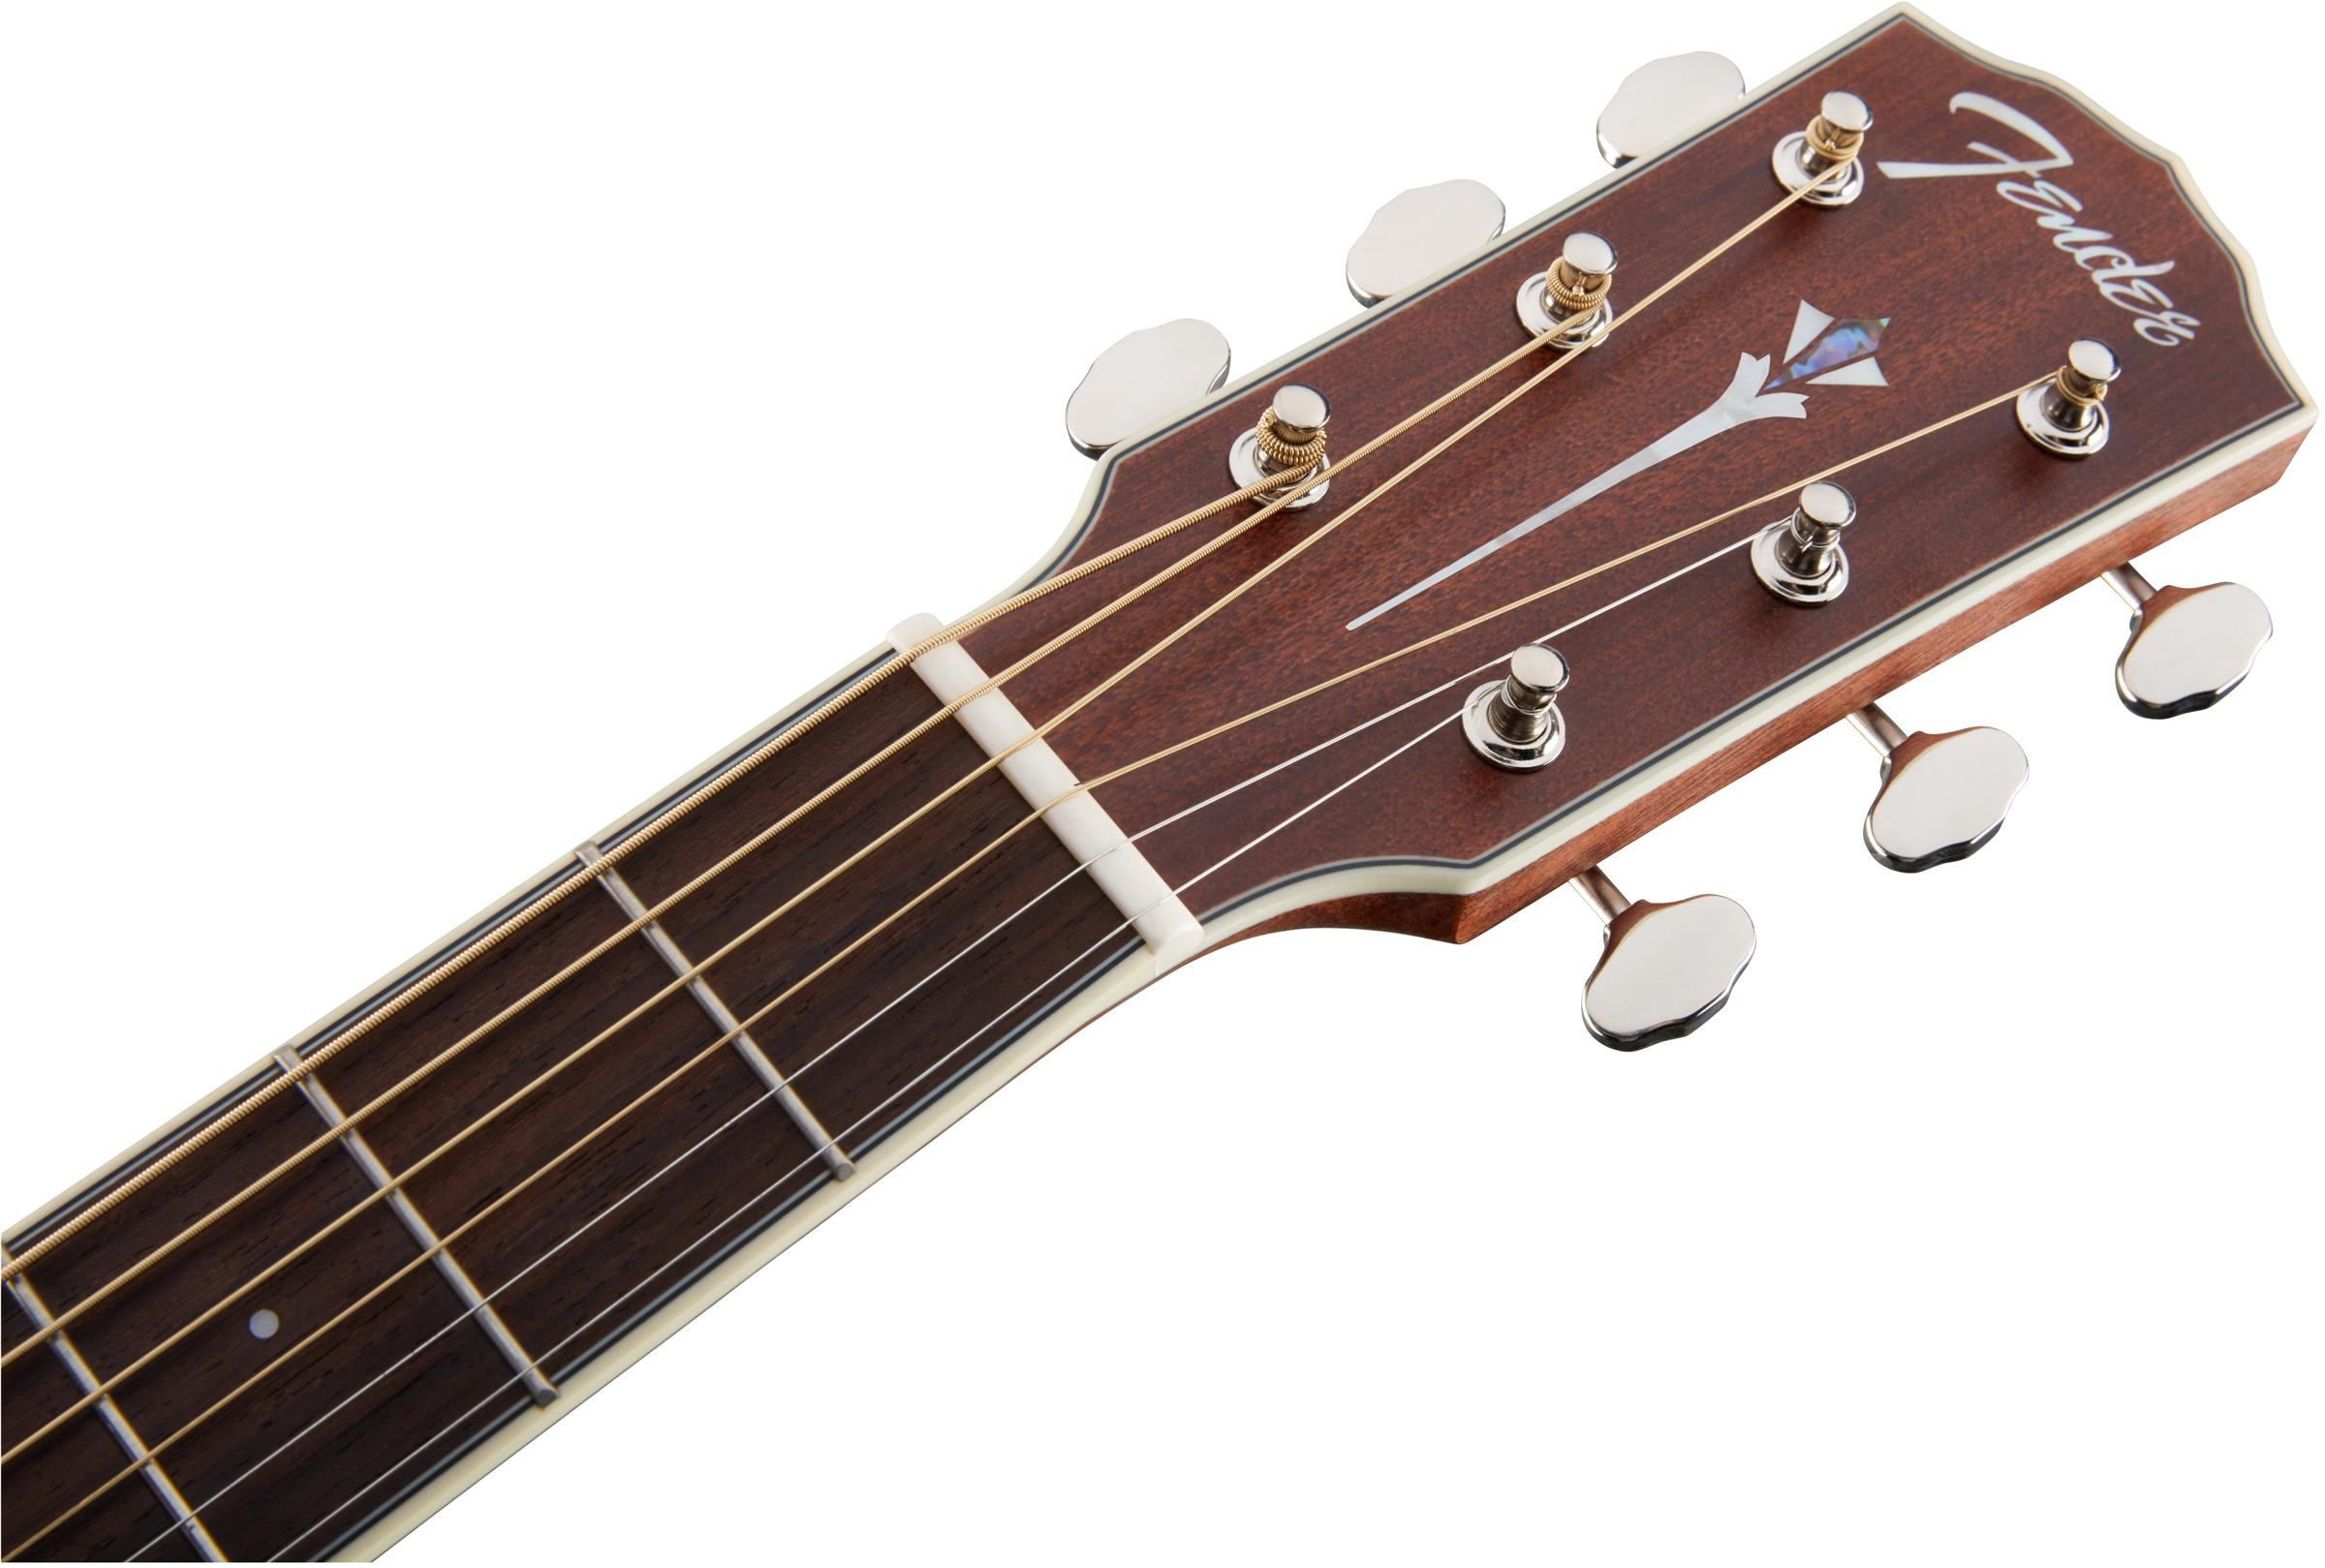 pm 1 standard dreadnought all mahogany ne acoustic guitars. Black Bedroom Furniture Sets. Home Design Ideas